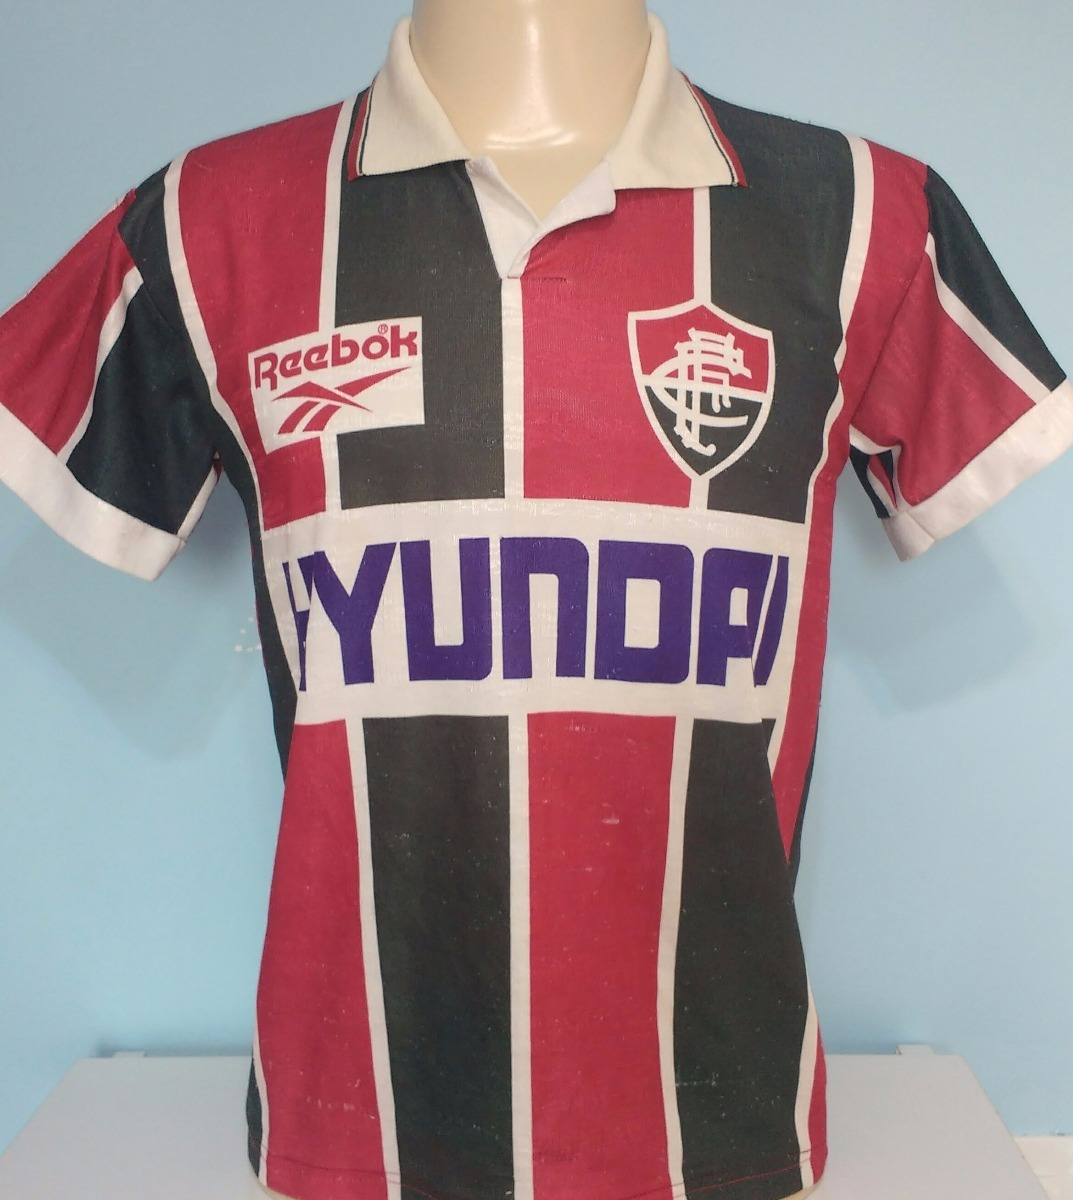 camisa fluminense antiga reebok campeão carioca 1995 - 95. Carregando zoom. 1c46ddf360bc1